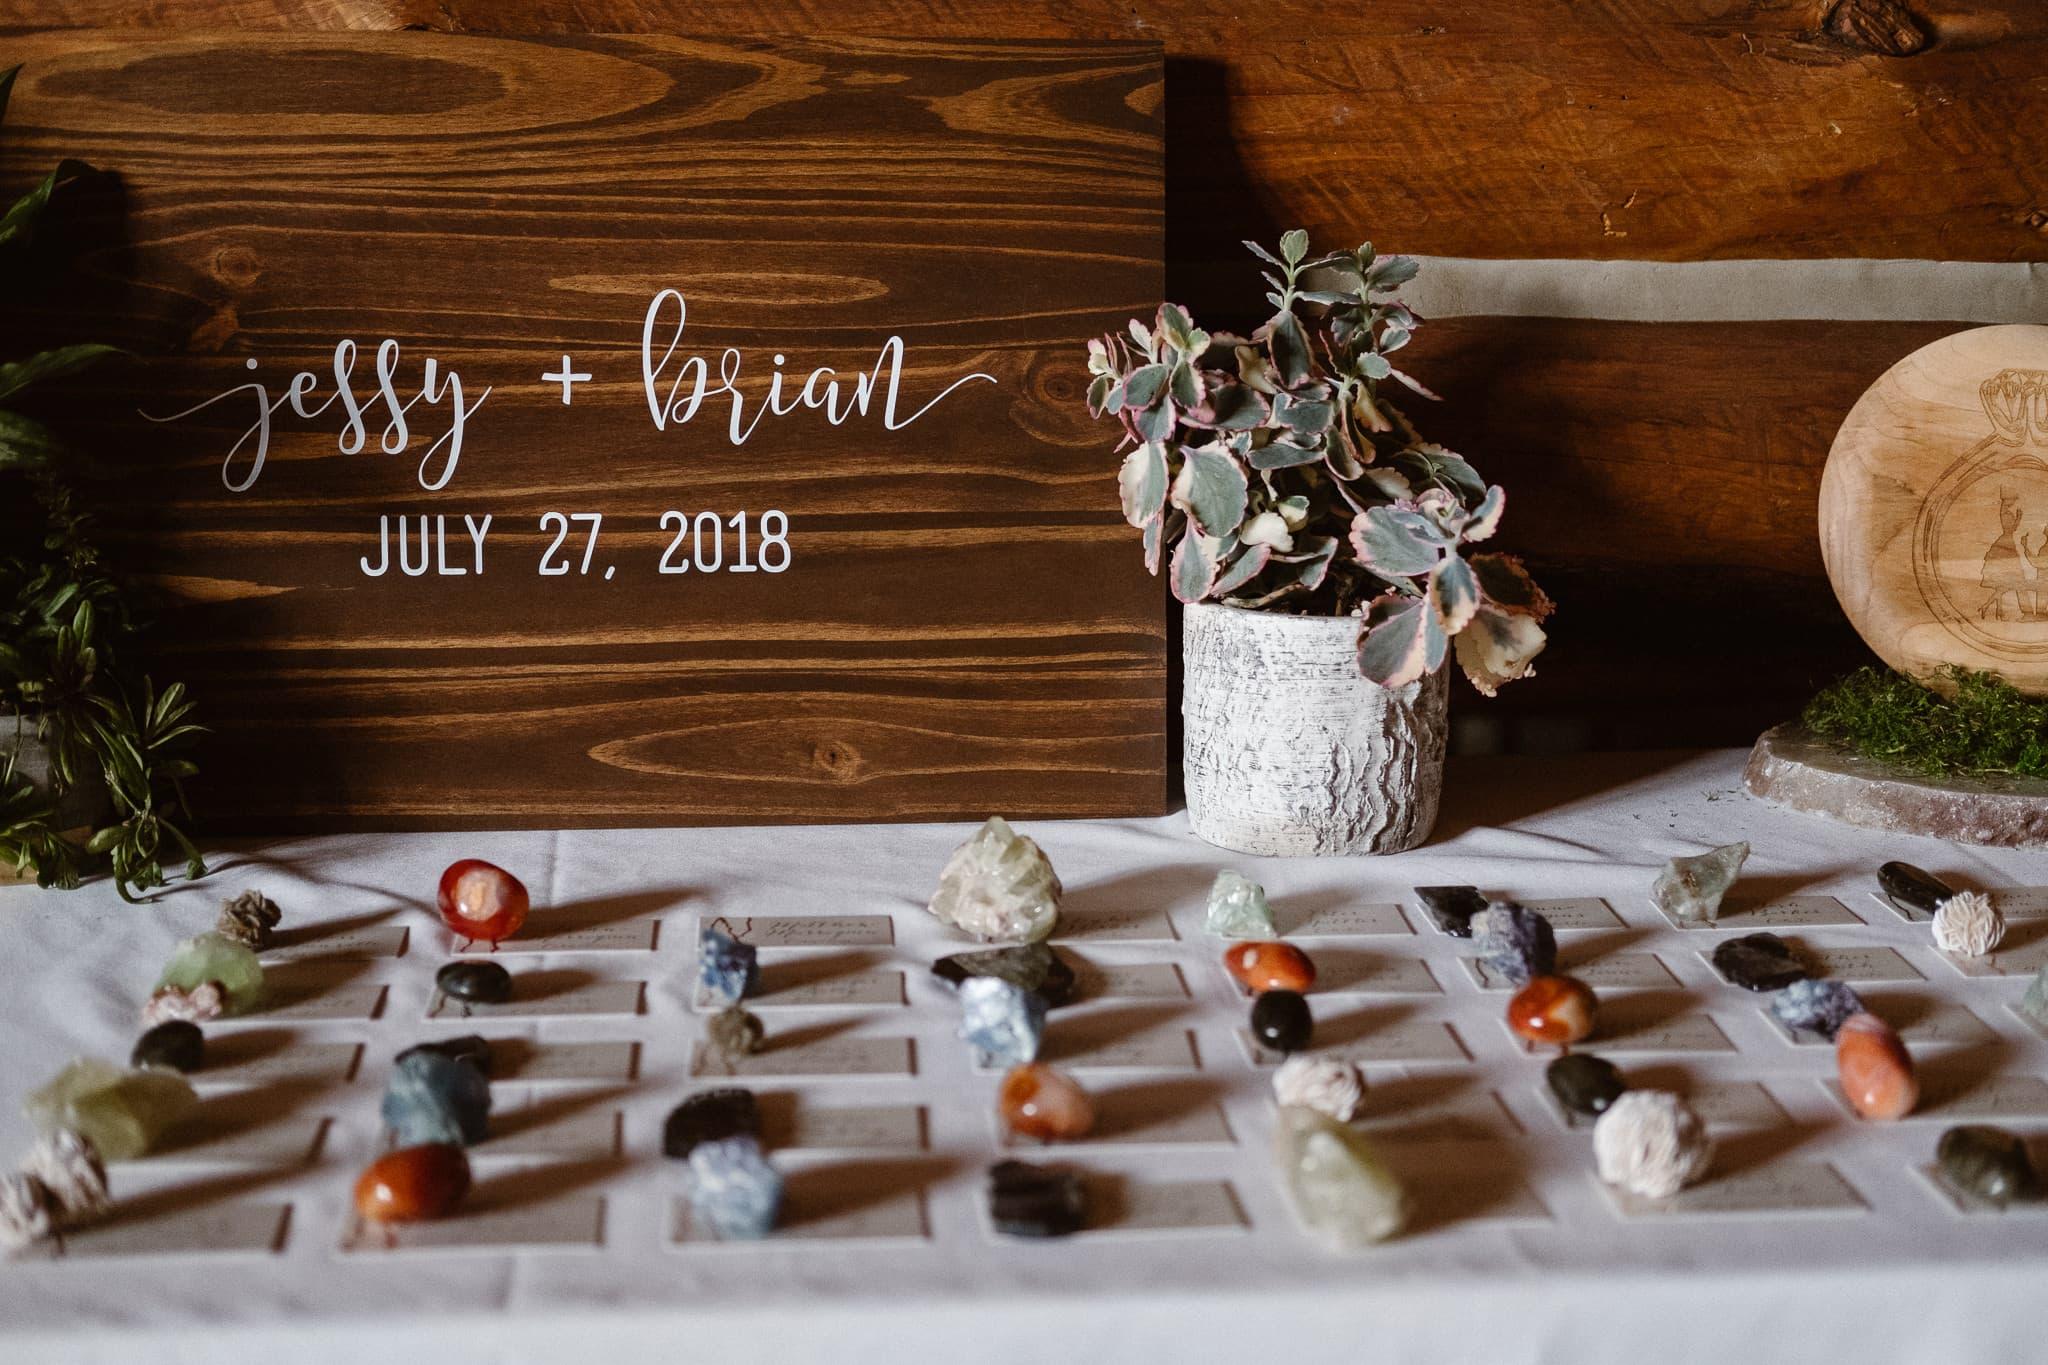 Dao House wedding photographer, Estes Park wedding venue, Colorado mountain wedding, gemstone place cards, wood wedding sign